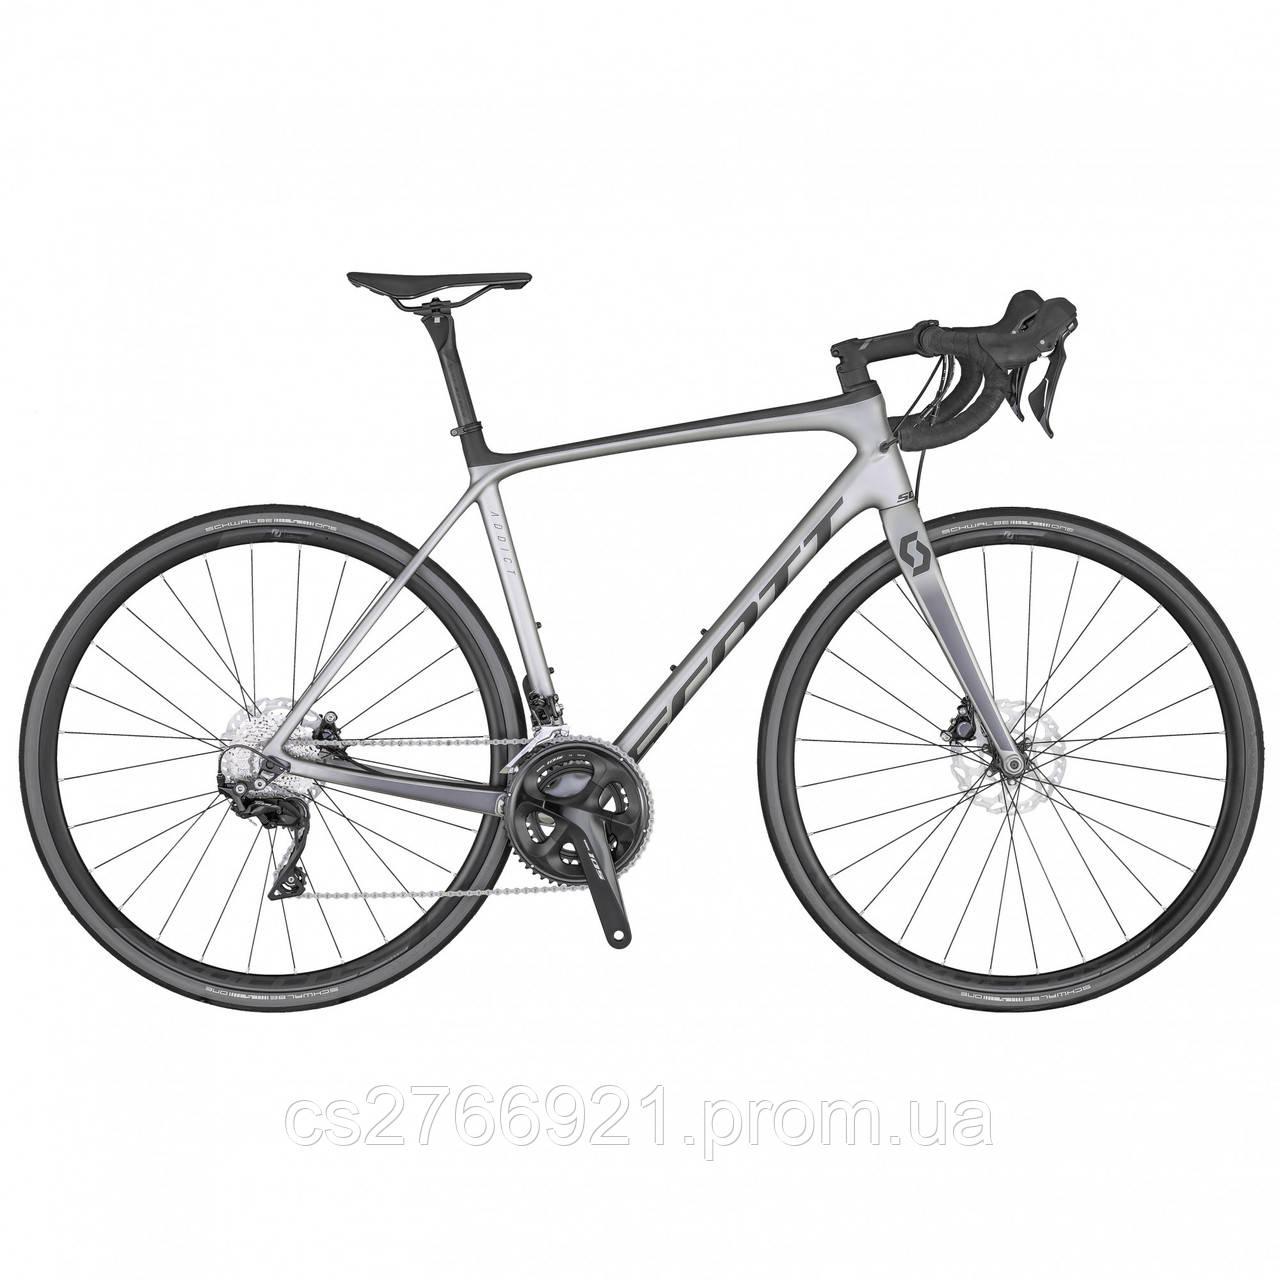 Велосипед ADDICT 20 DISC серый (TW) 20 SCOTT